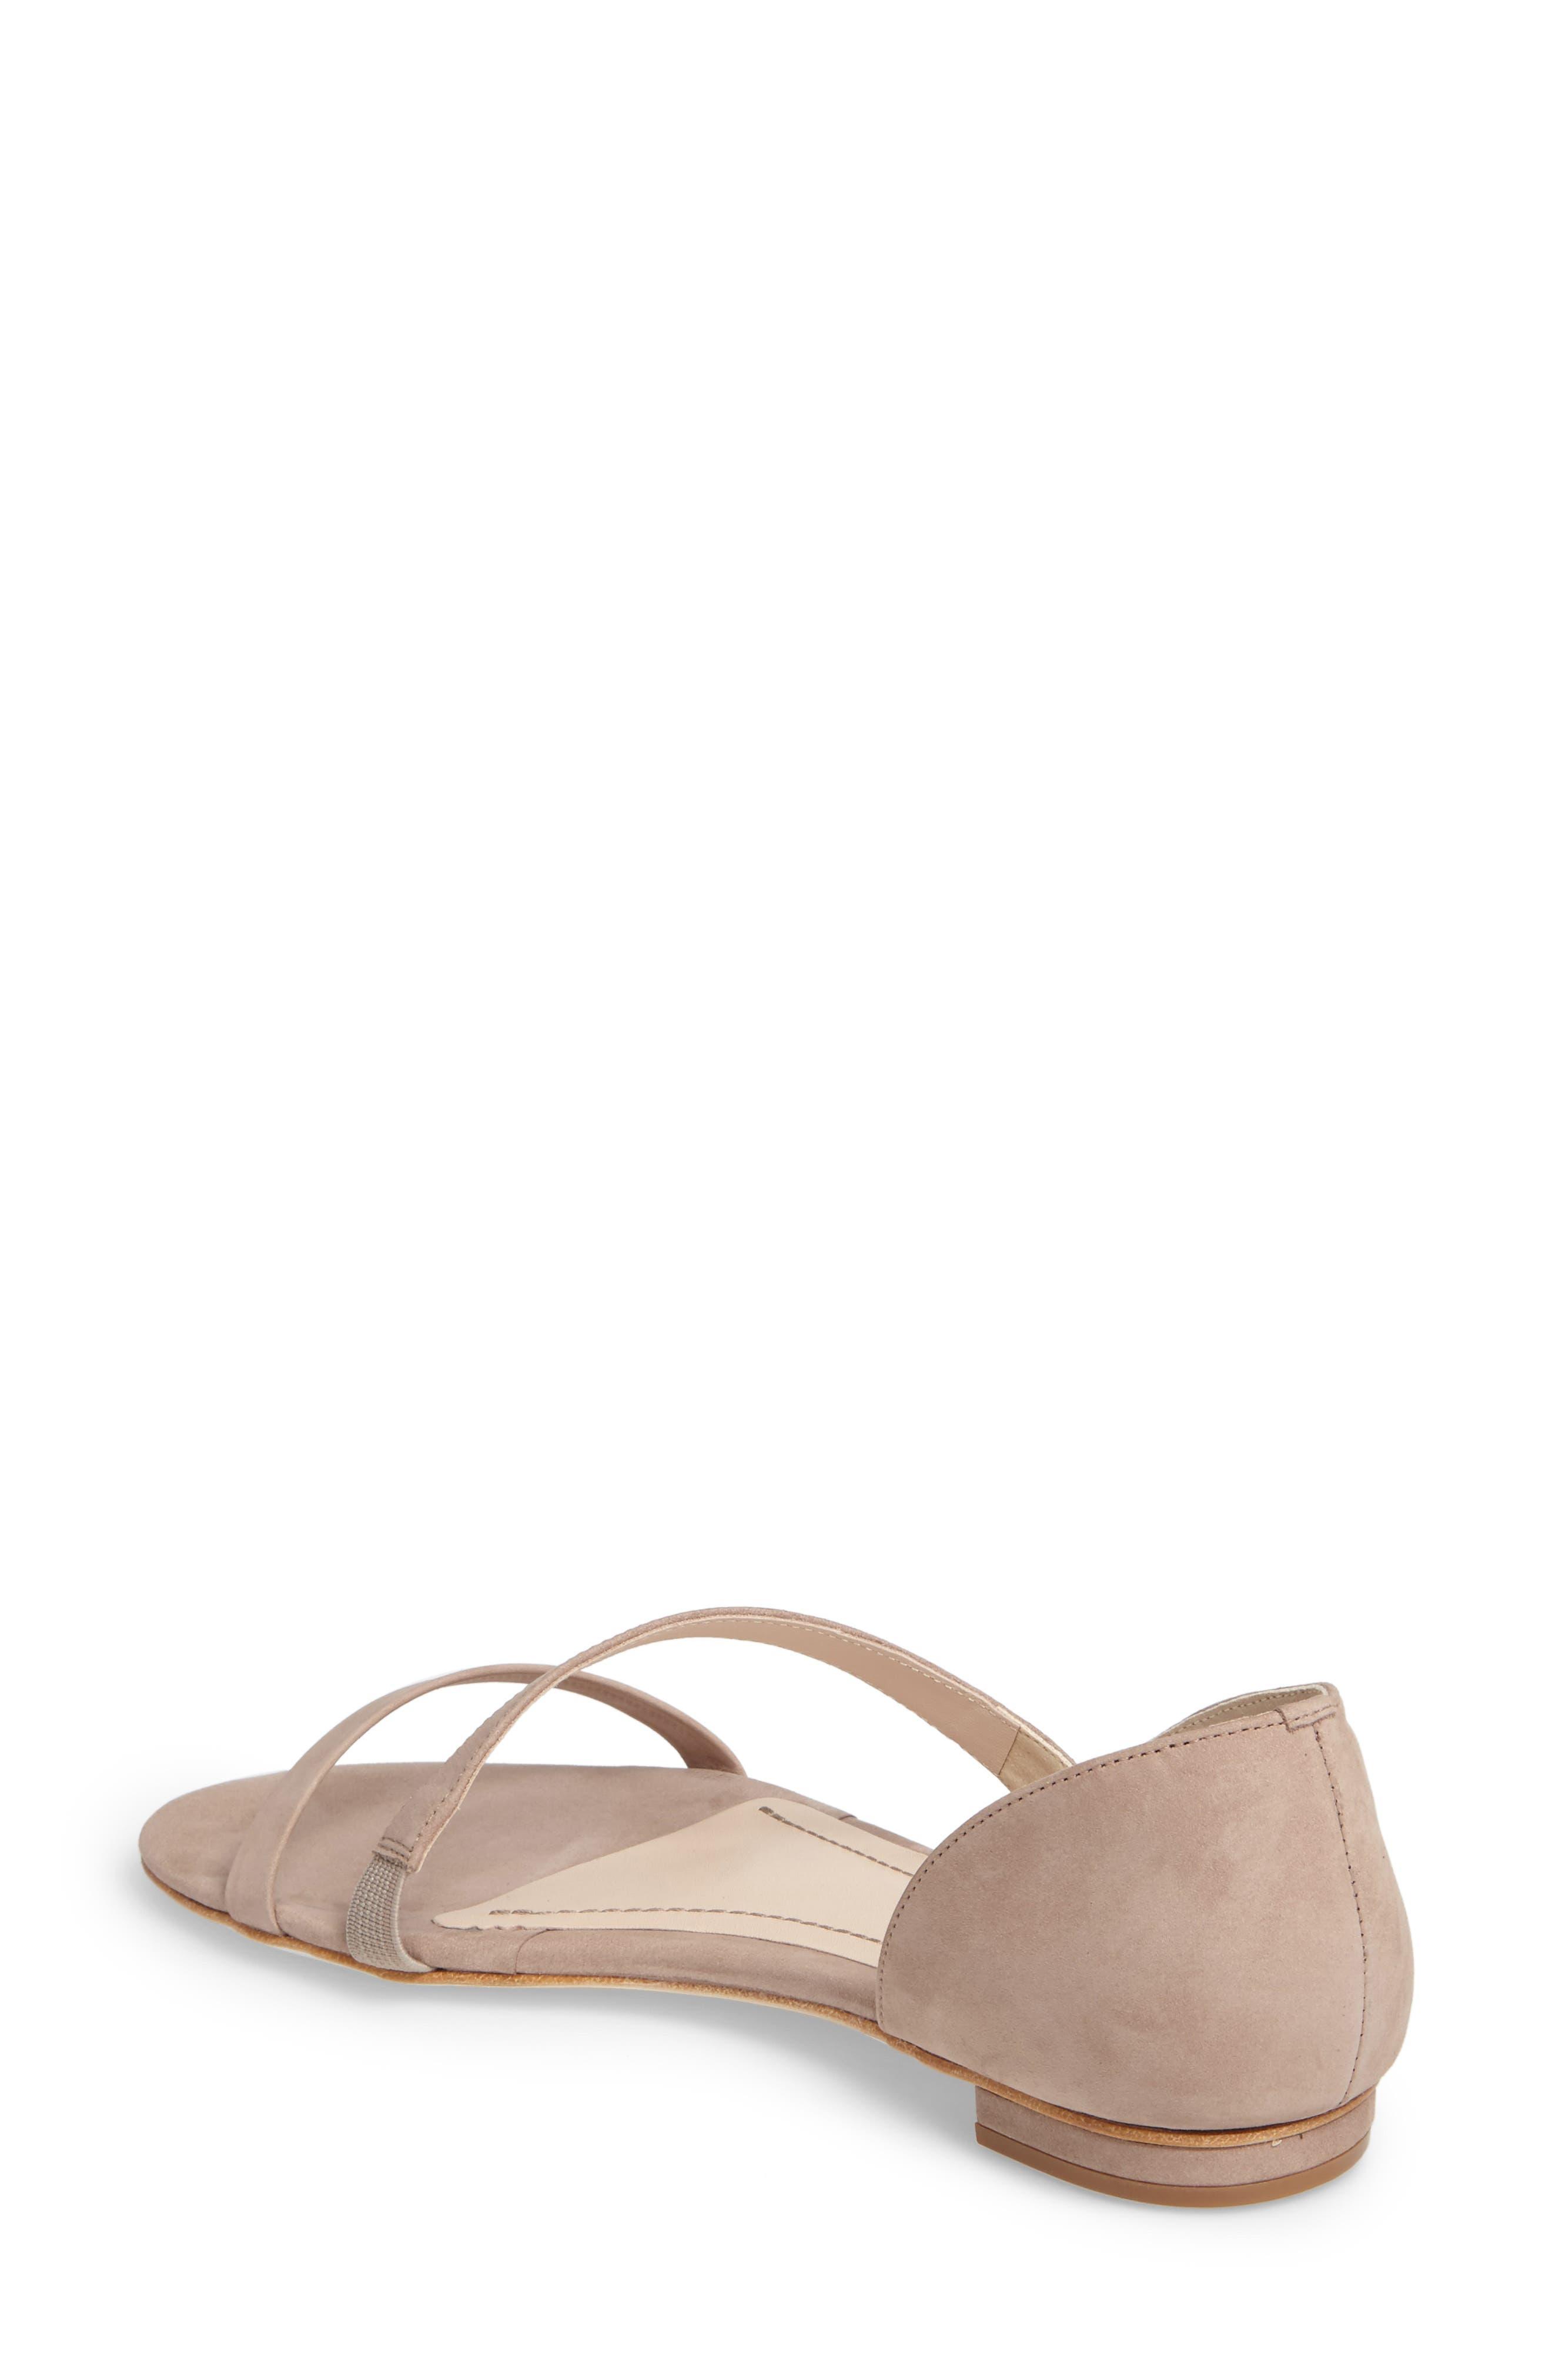 Jeanne Sandal,                             Alternate thumbnail 2, color,                             Taupe Leather